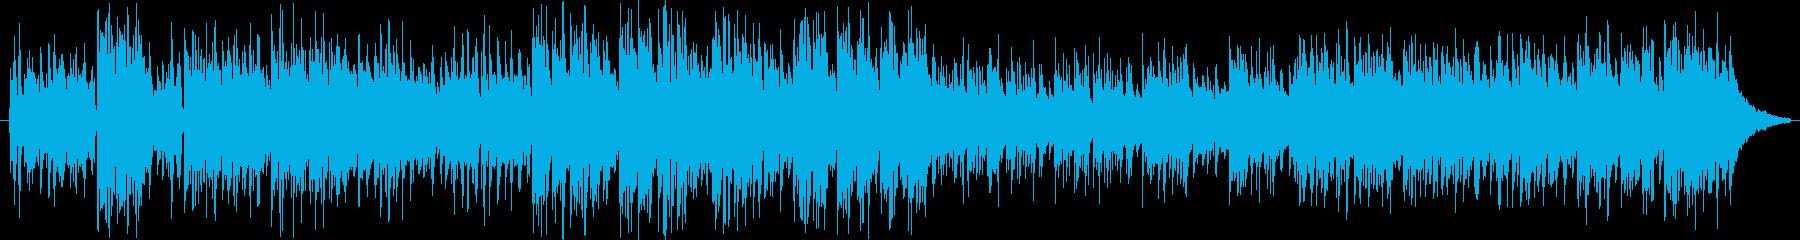 Gガーシュインの名曲を軽快なルンバでの再生済みの波形